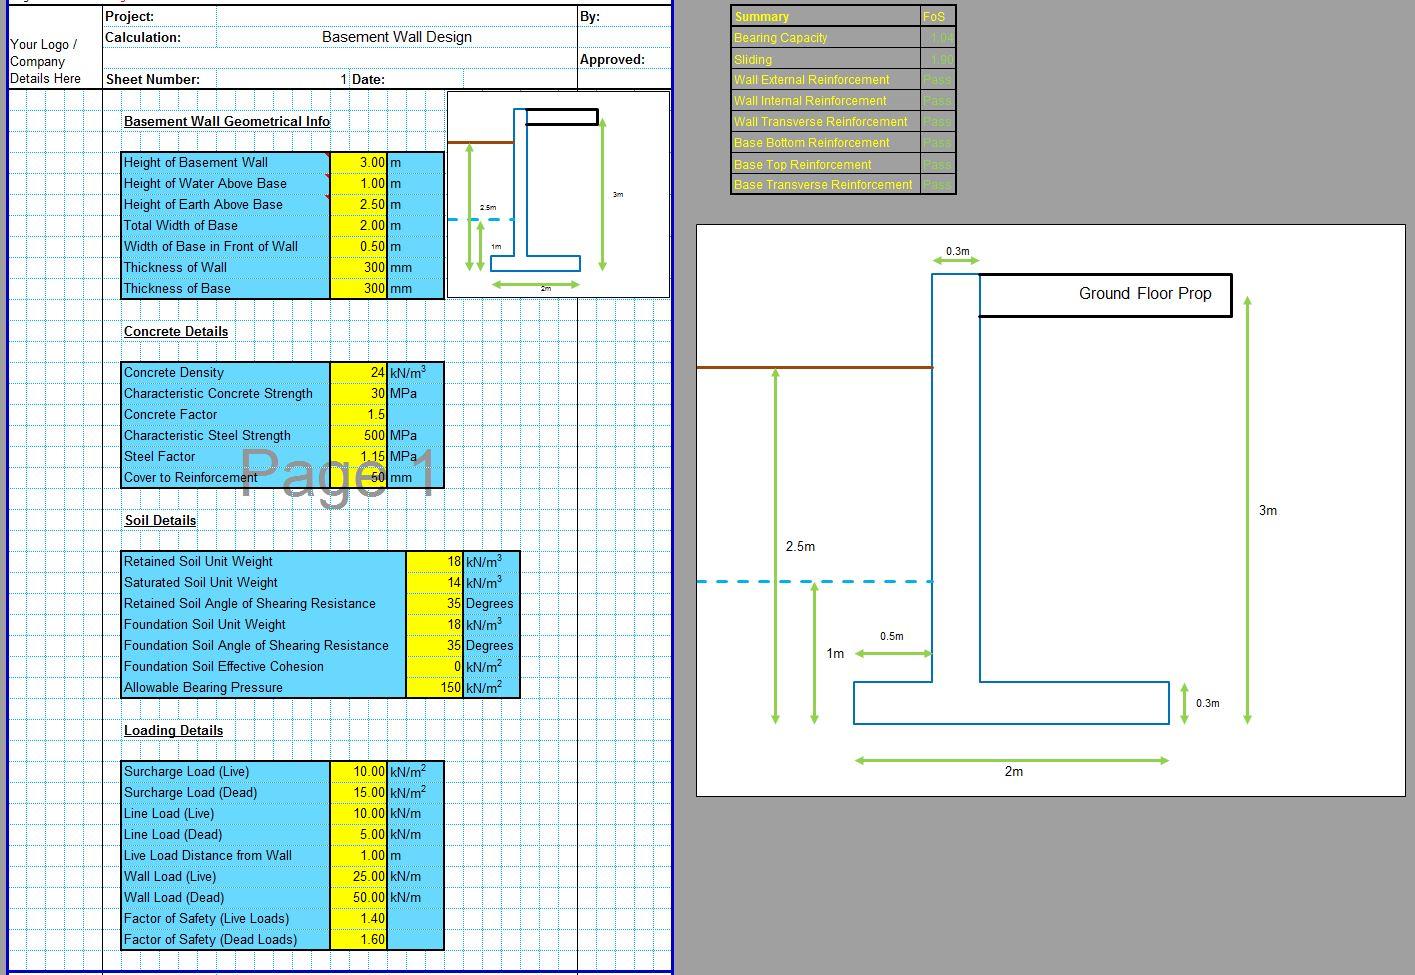 Concrete Basement Wall Design Spreadsheet 1